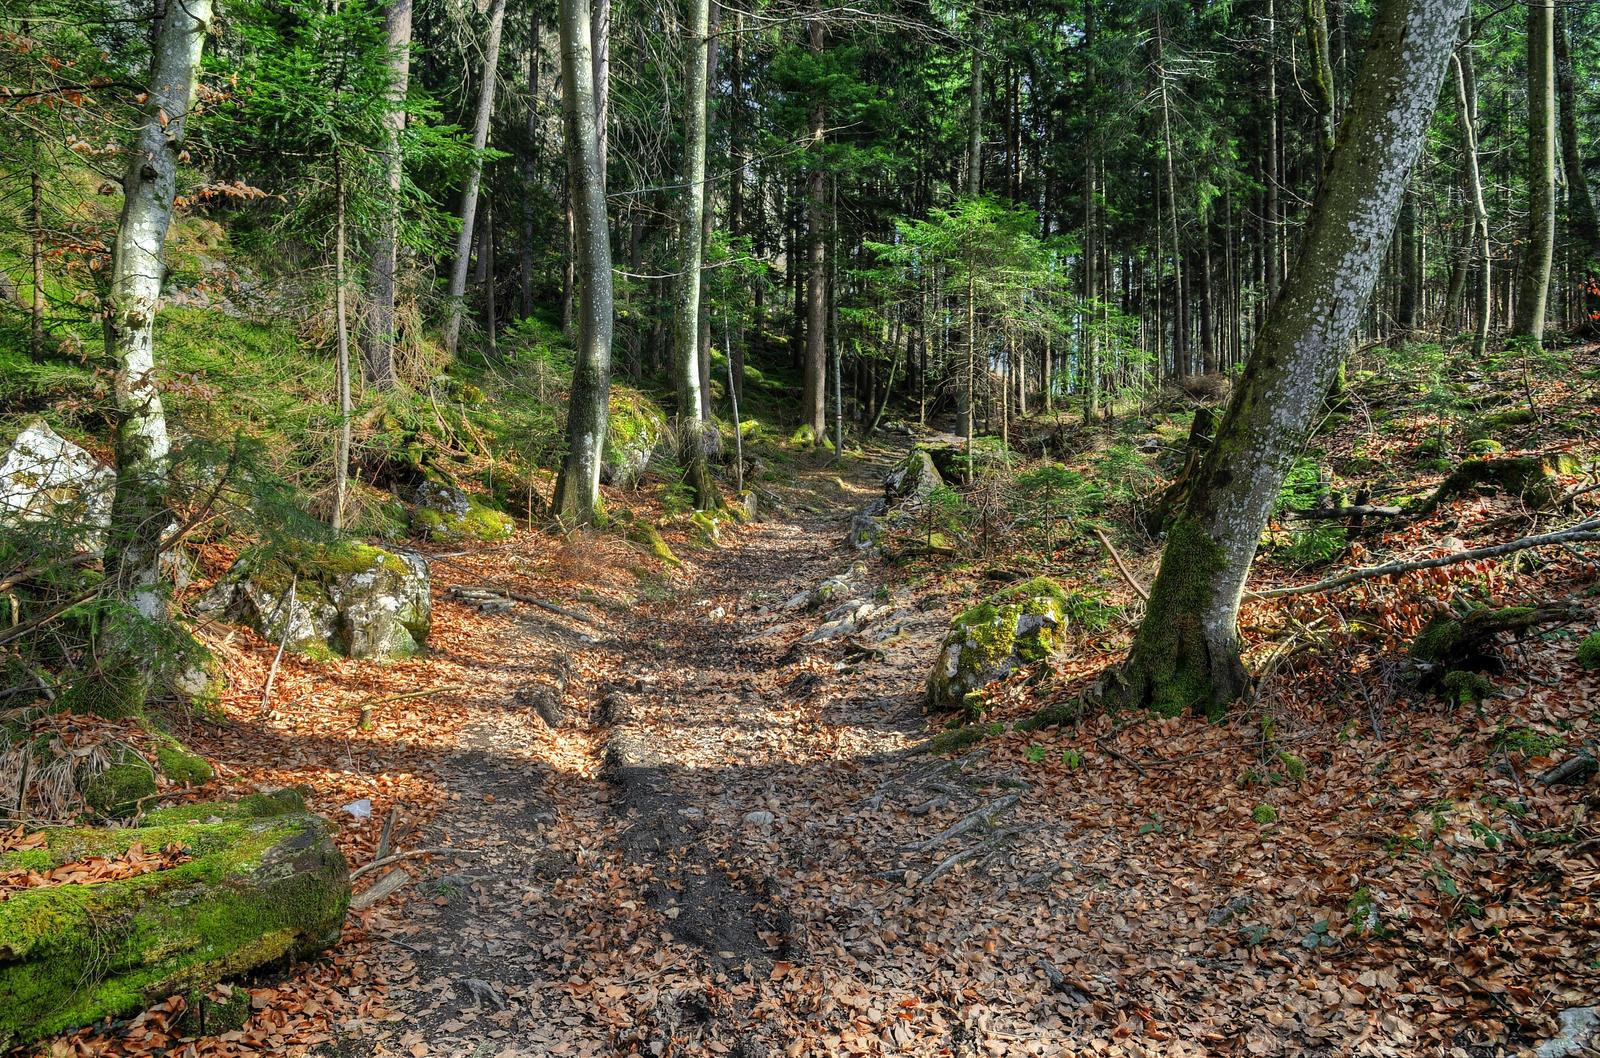 Through The Woods by Burtn